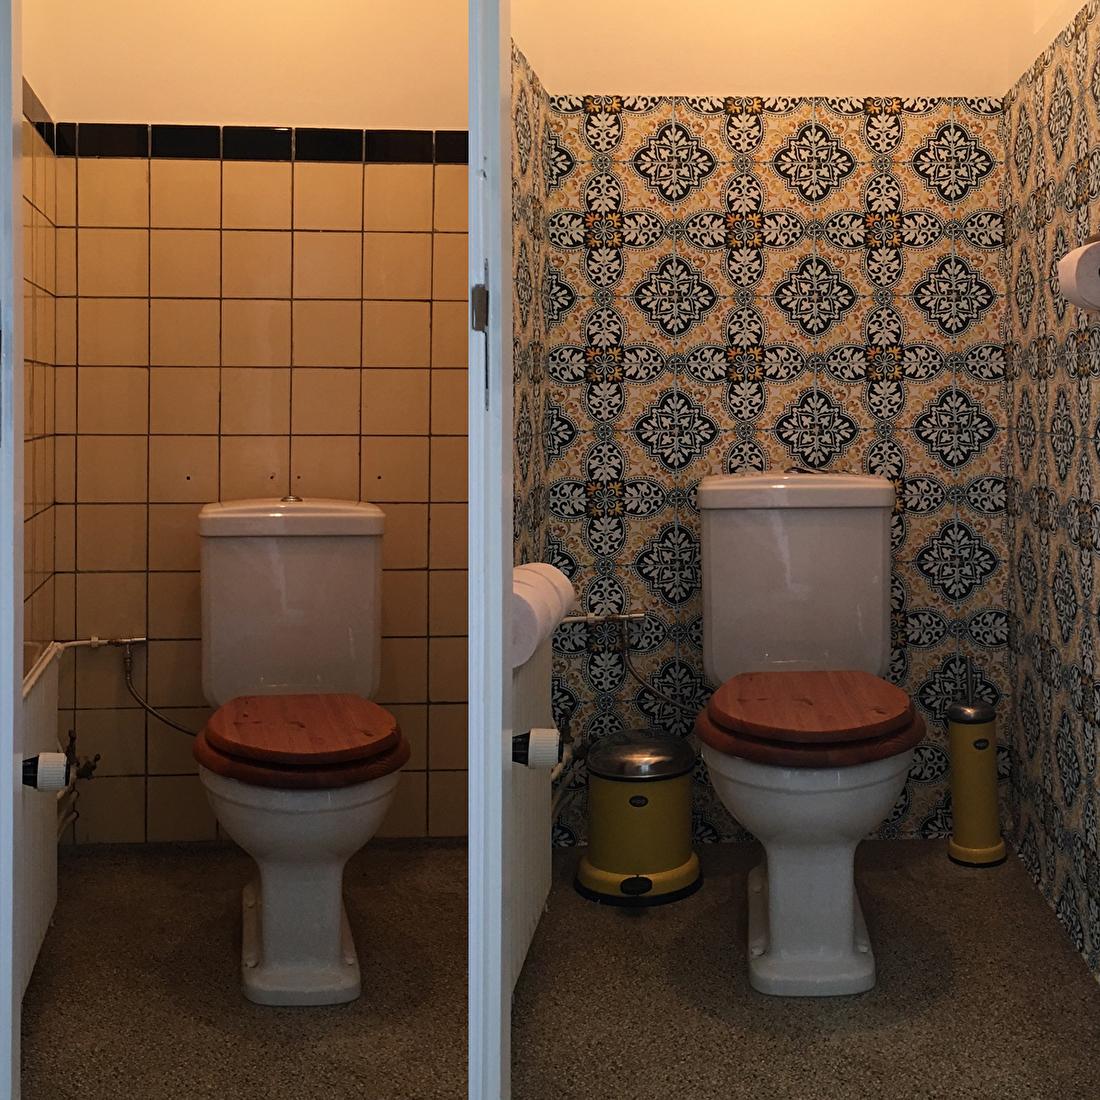 kitchenwalls makeover toilet